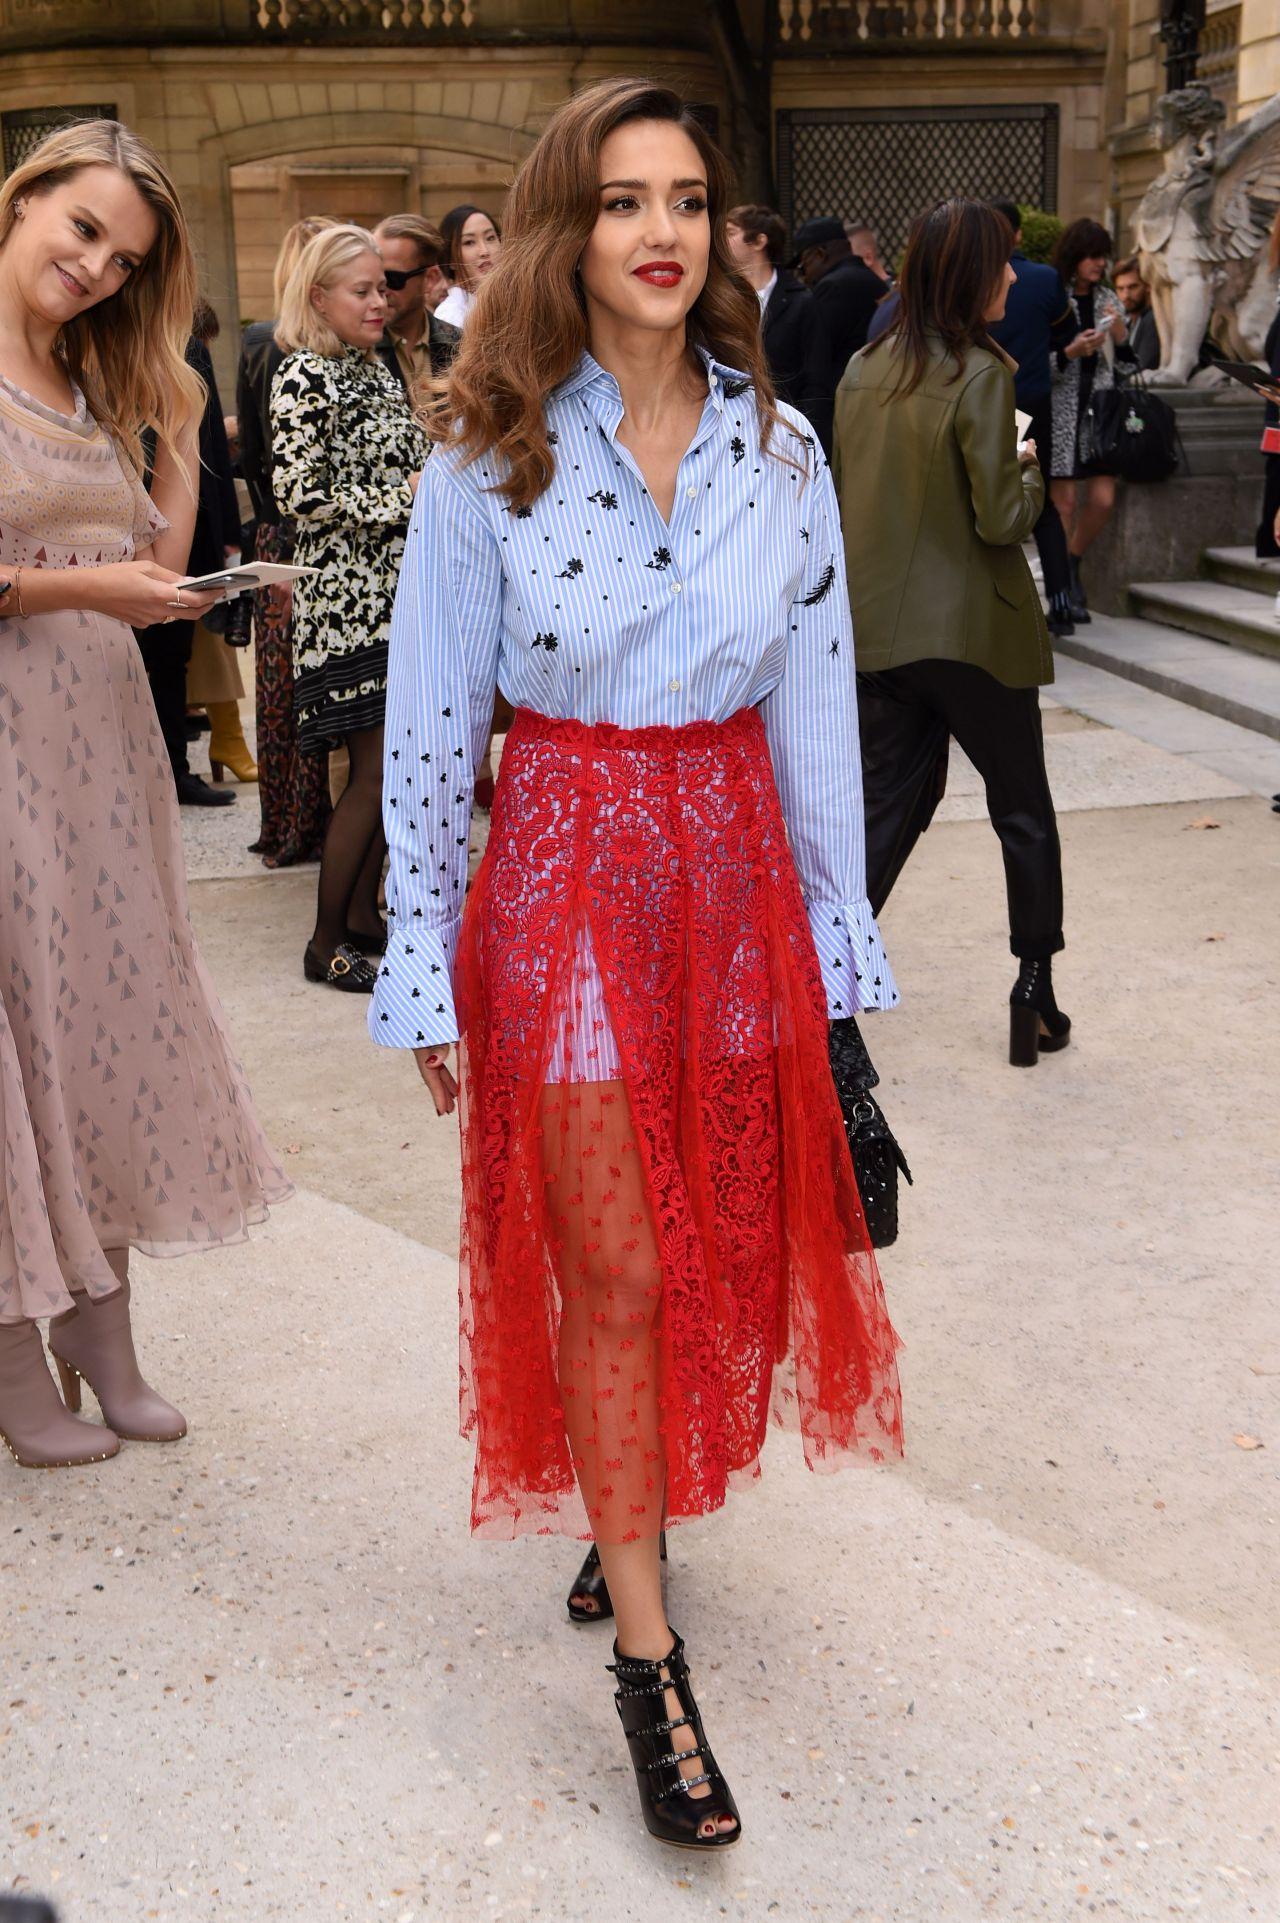 Celebrities Trands Jessica Alba Arrives At The Valentino Show Paris Fashion Week 10 2 2016